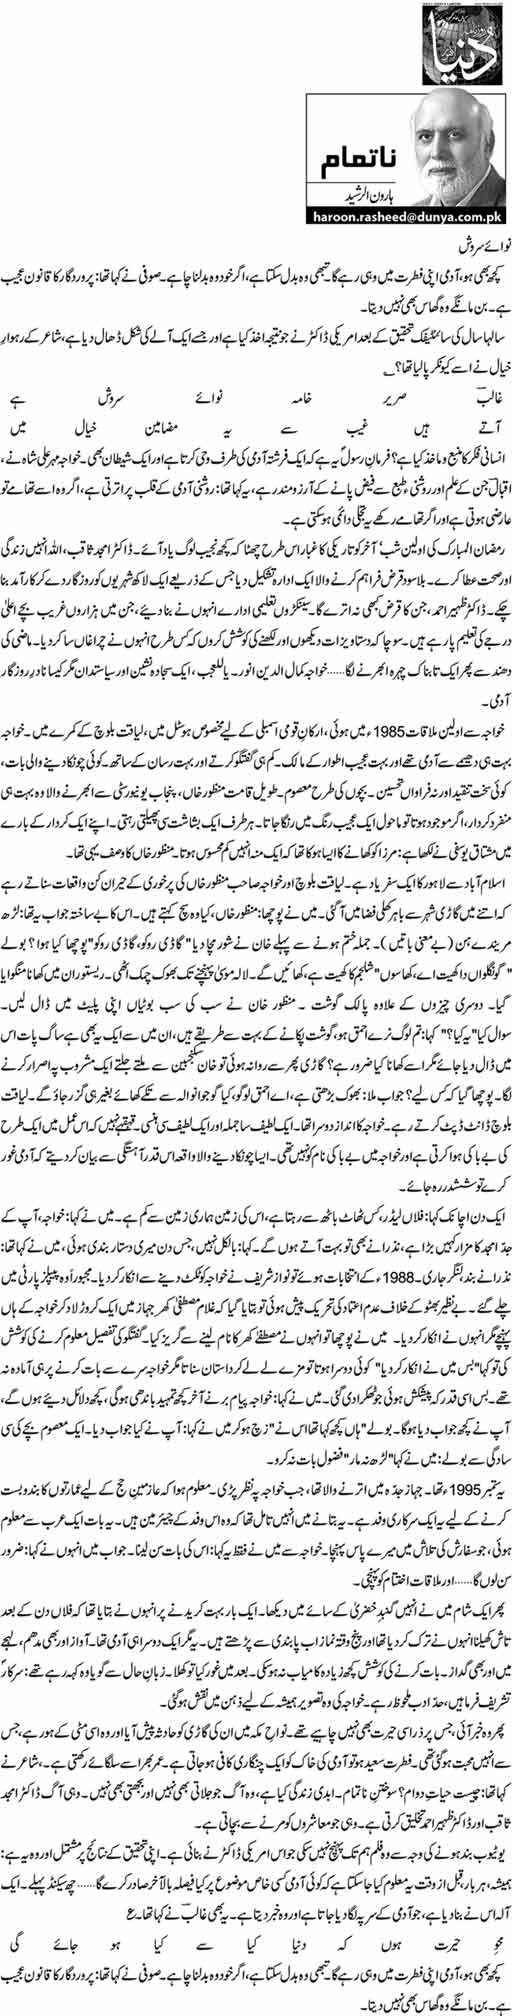 Nawaye Sirosh - Haroon-ur-Rasheed